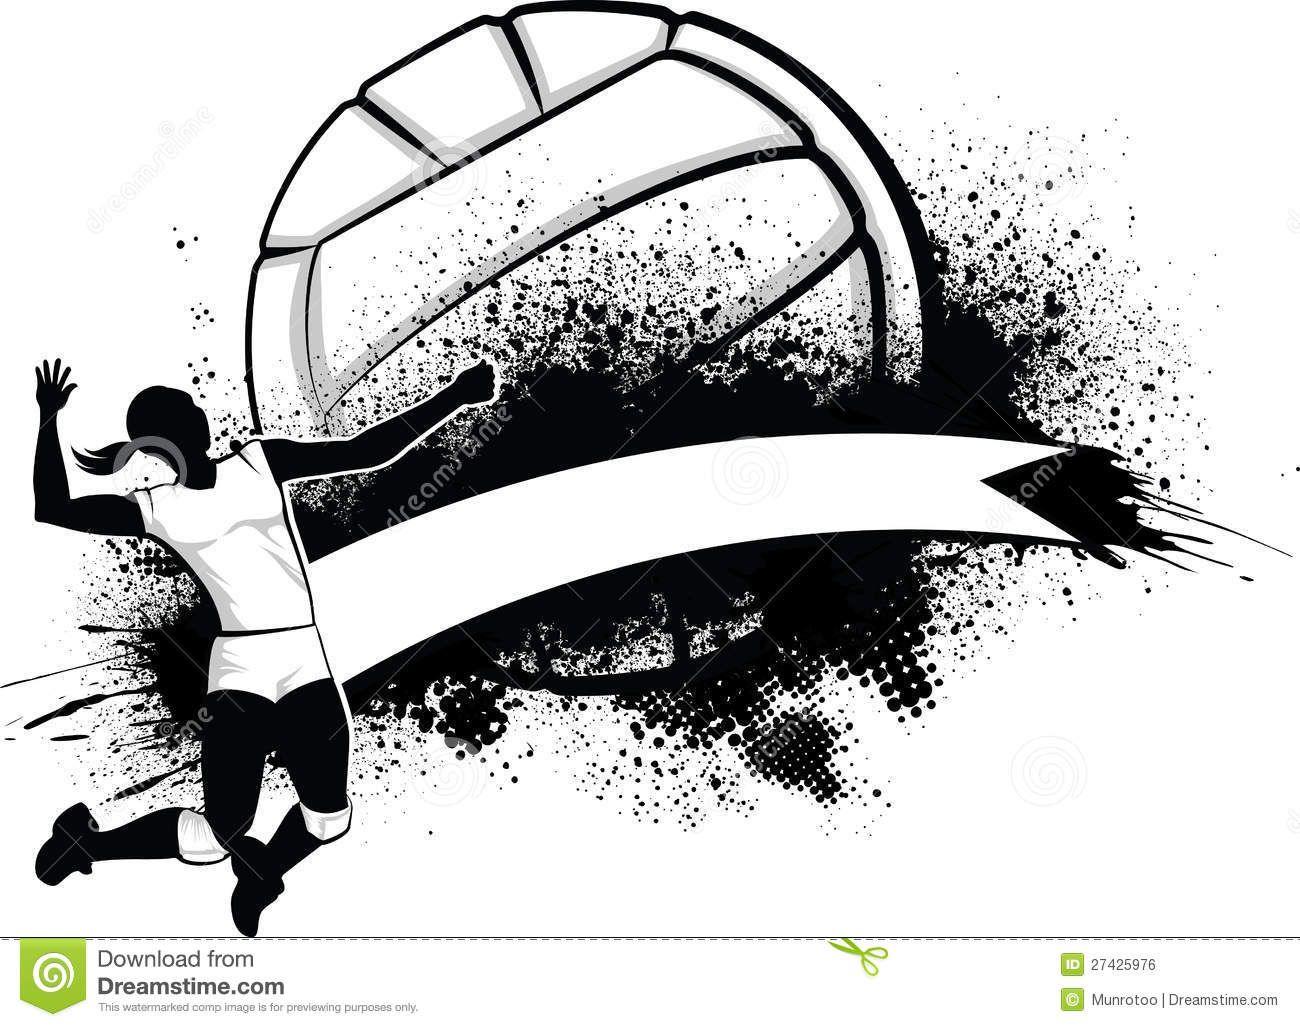 Girl Volleyball Grunge Banner 27425976 Jpg 1300 1027 Volleyball Images Volleyball Designs Volleyball